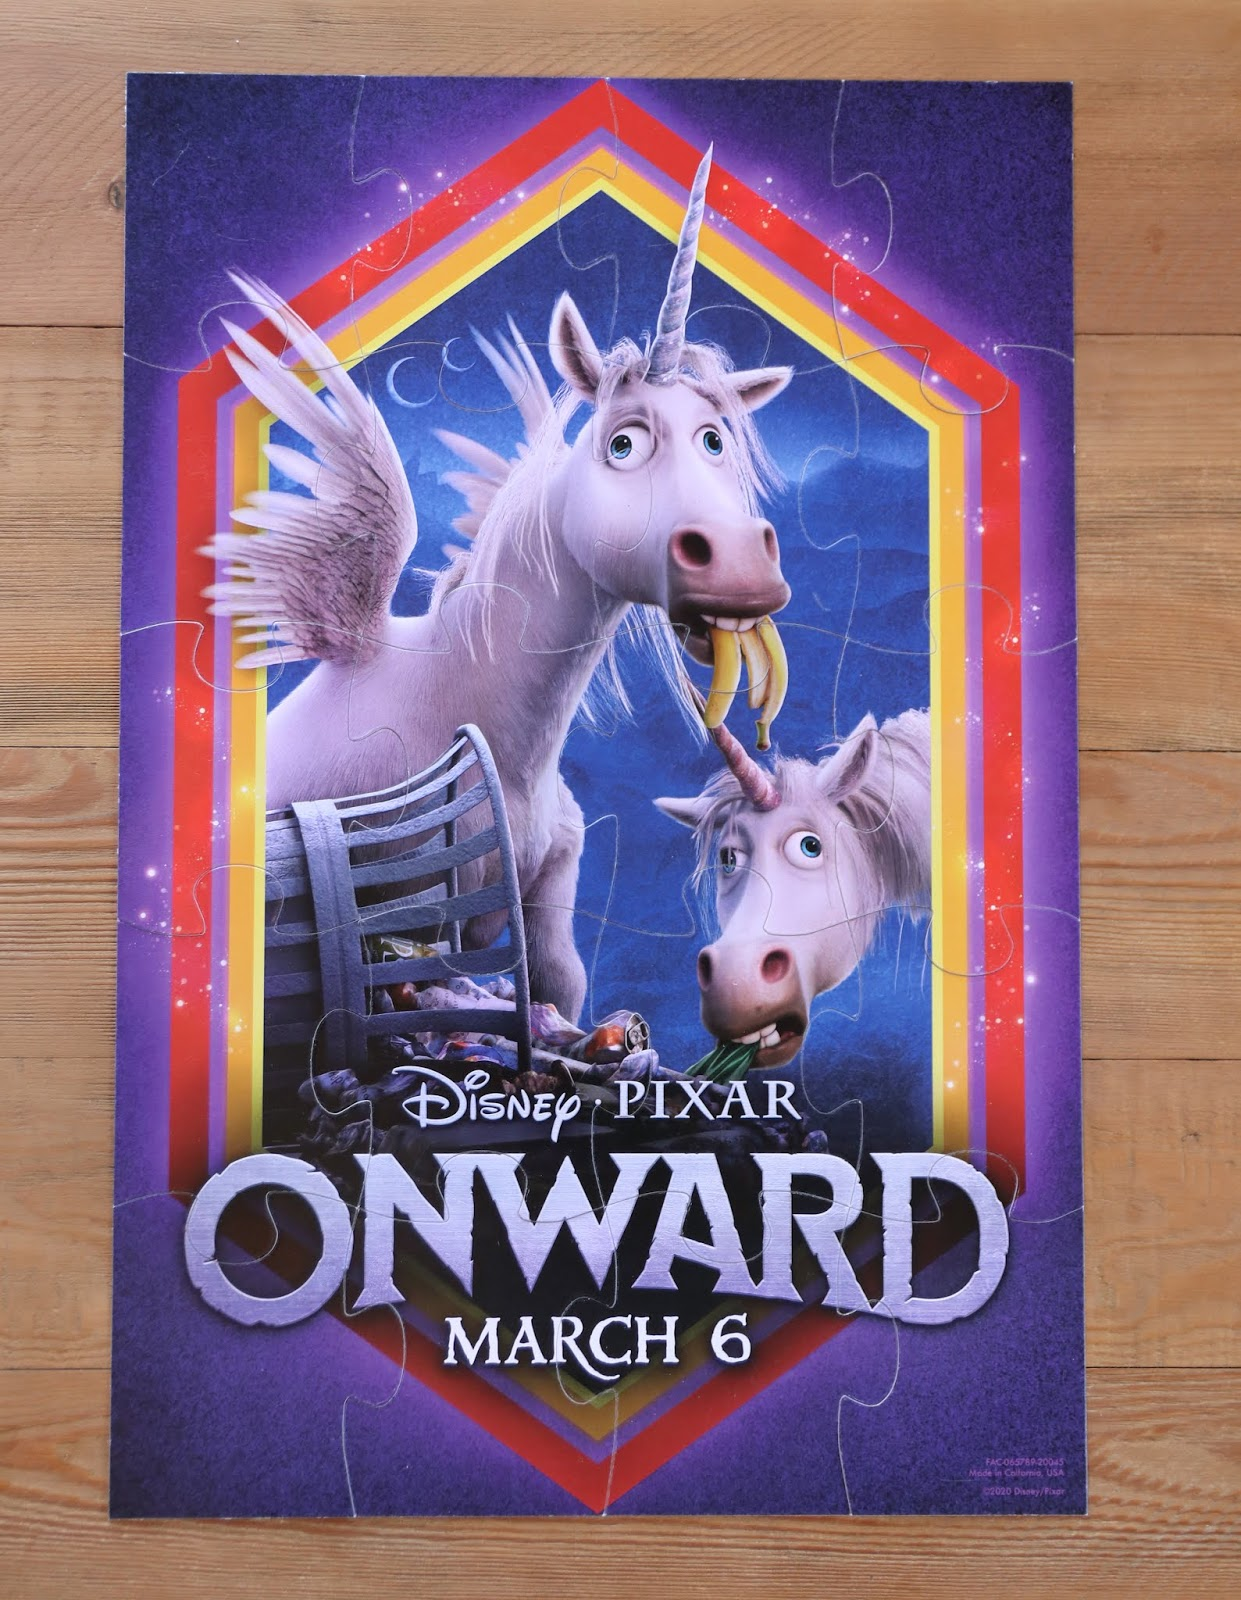 Pixar Onward Disney Store unicorn puzzle Pixar Onward Disney Store unicorn puzzle